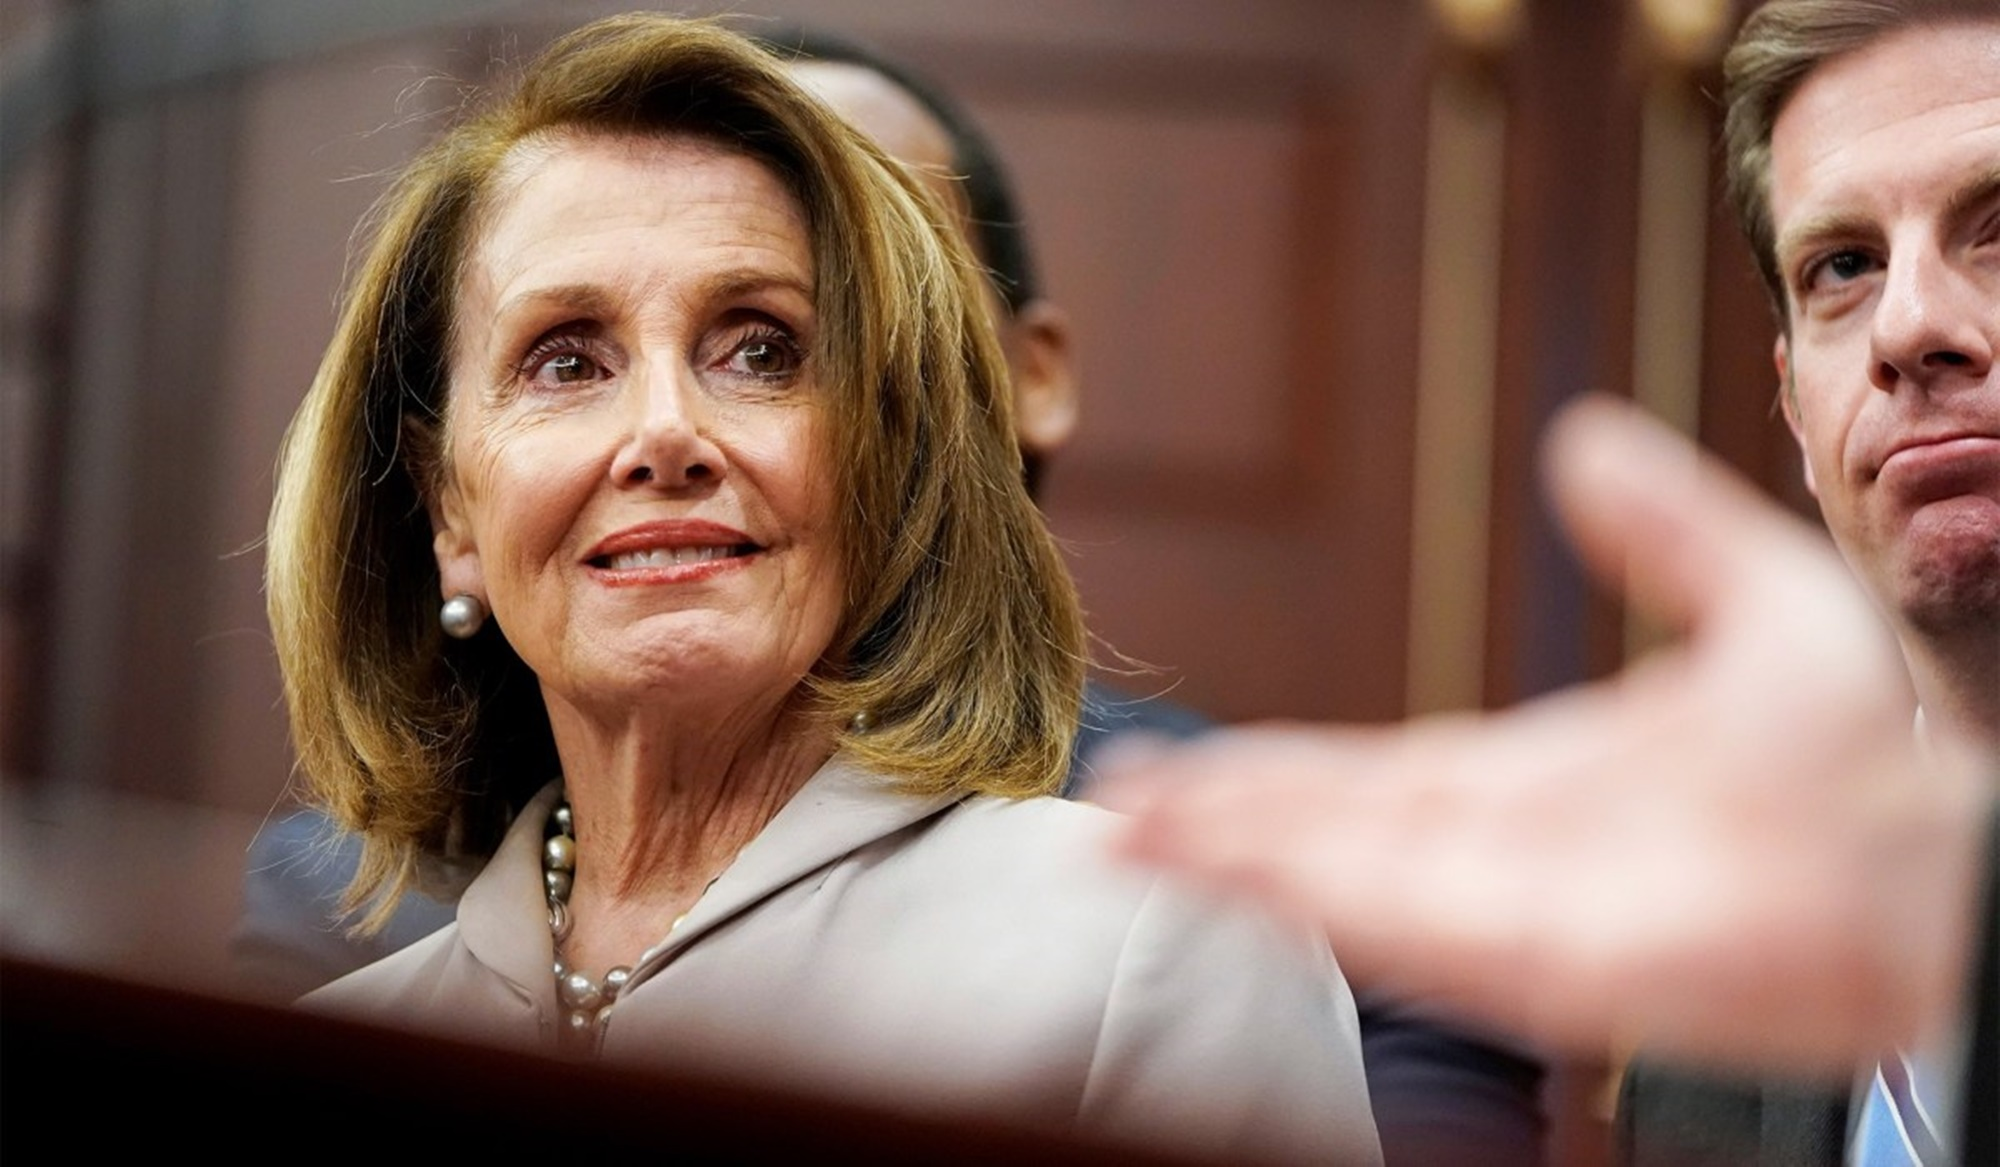 nancy-pelosi-defends-joe-biden-again-while-mocking-alexandria-ocasio-cortez-observers-say-she-badly-wants-democrats-to-win-in-2020